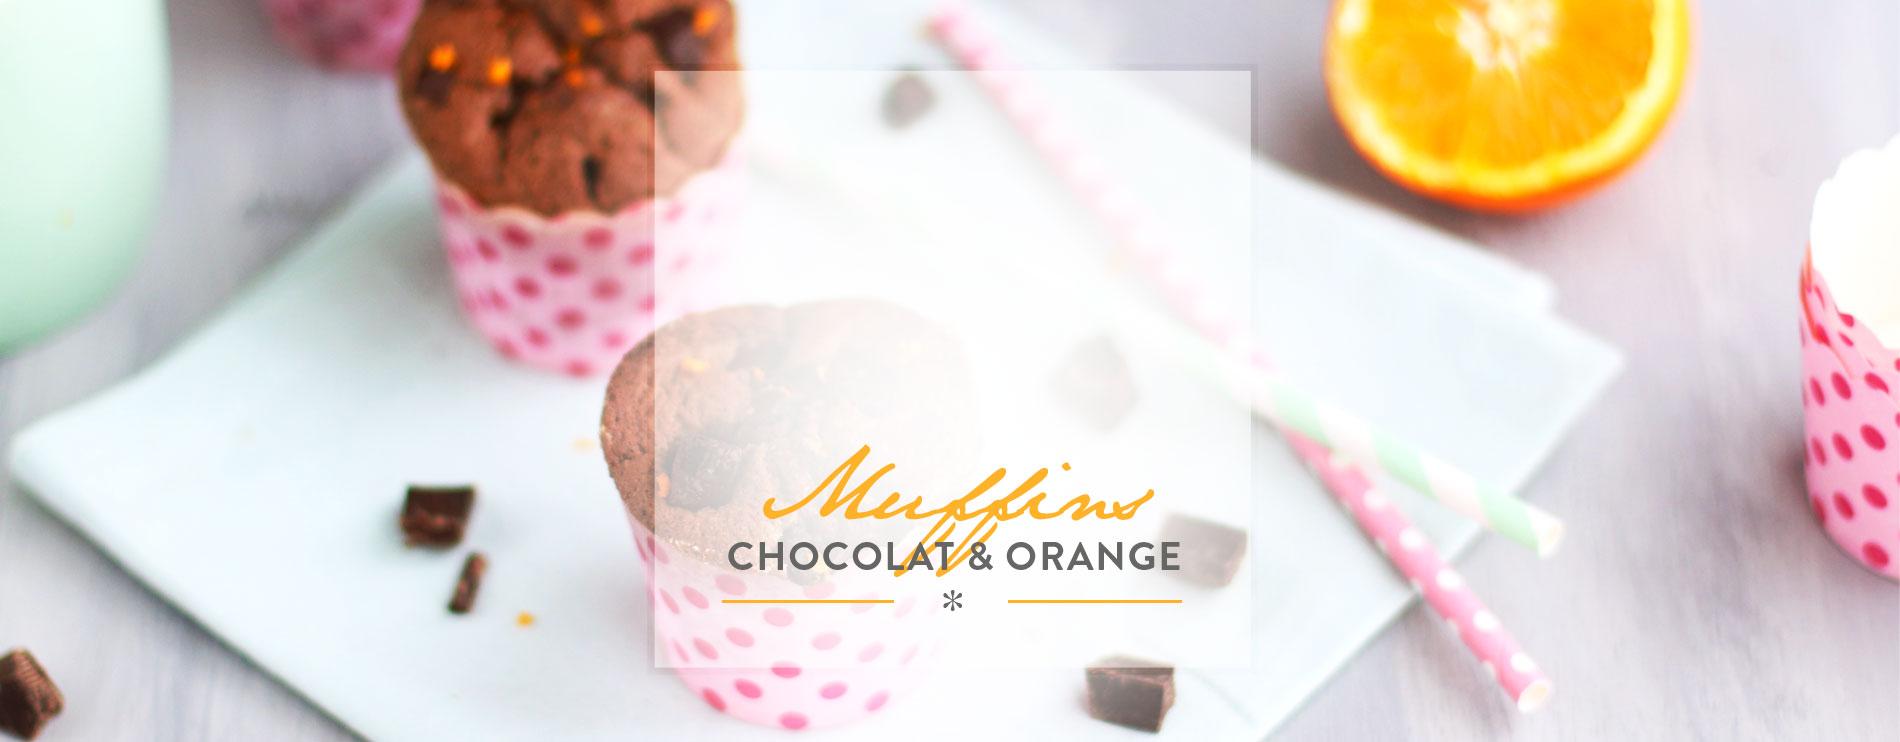 Muffins d'Aurélie